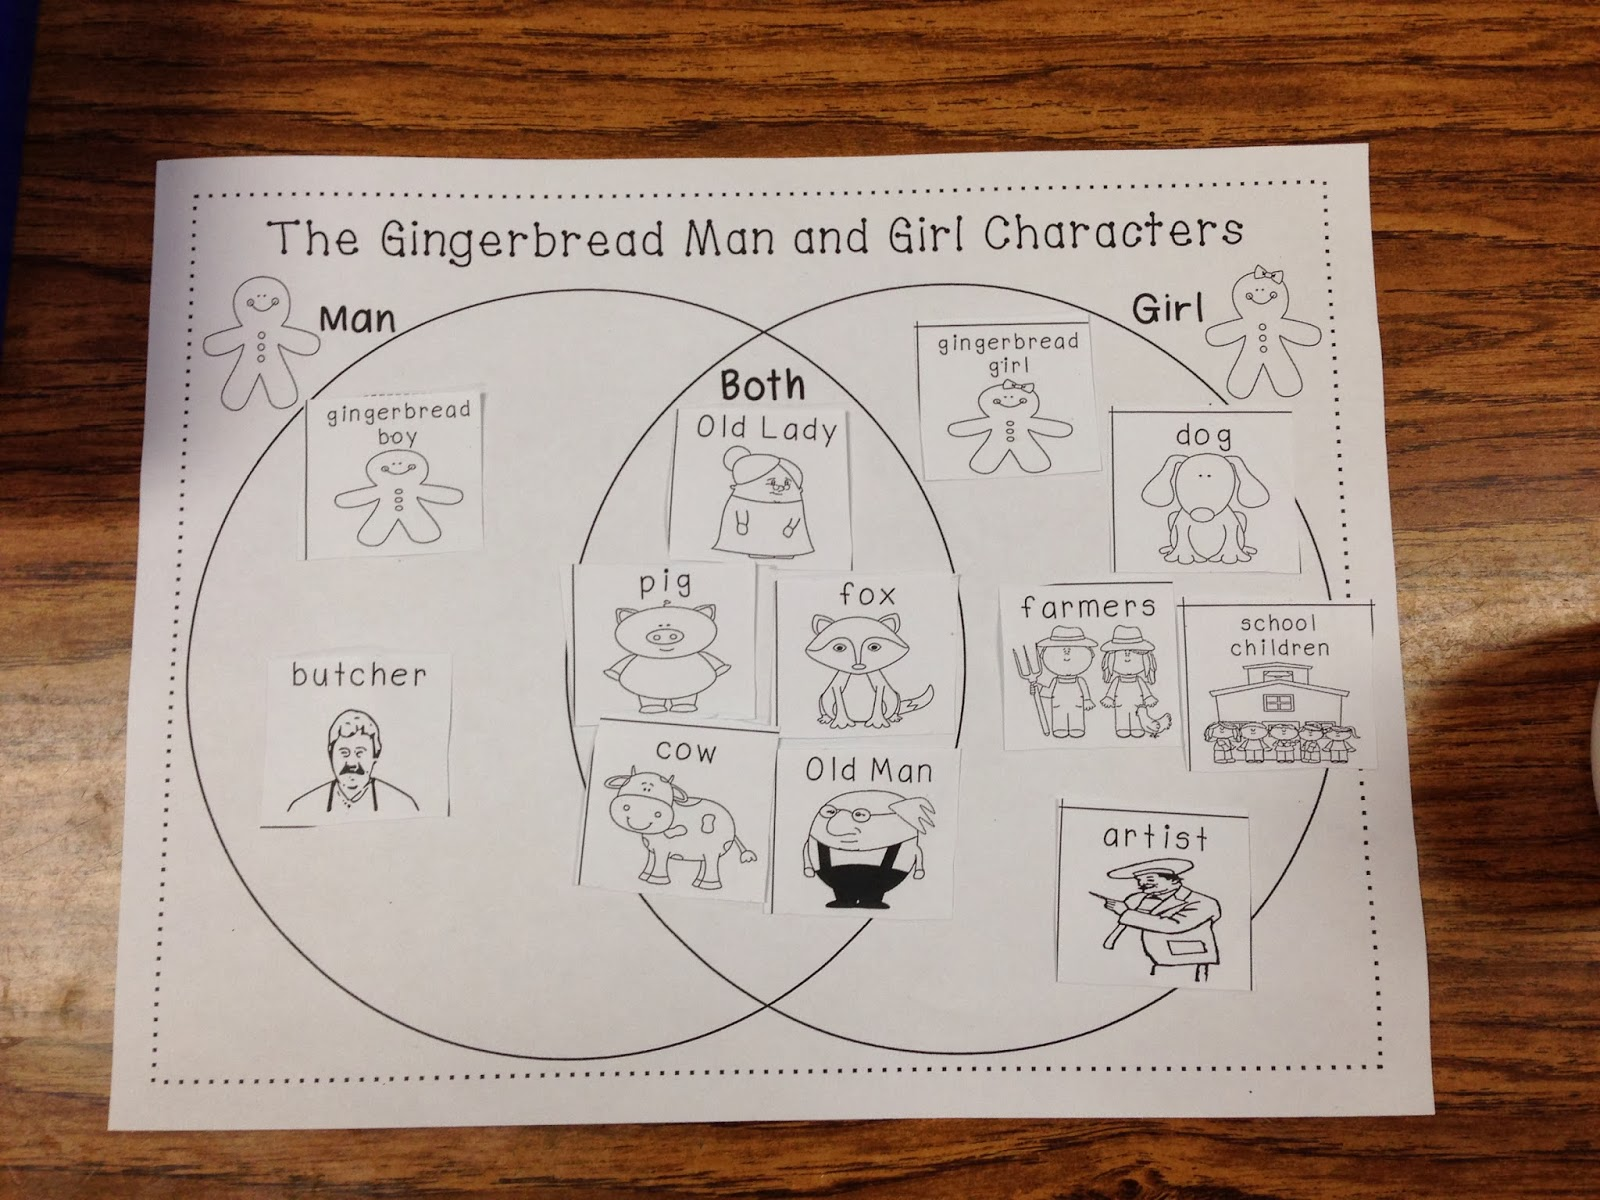 gingerbread venn diagram porsche 944 relay a spoonful of learning man